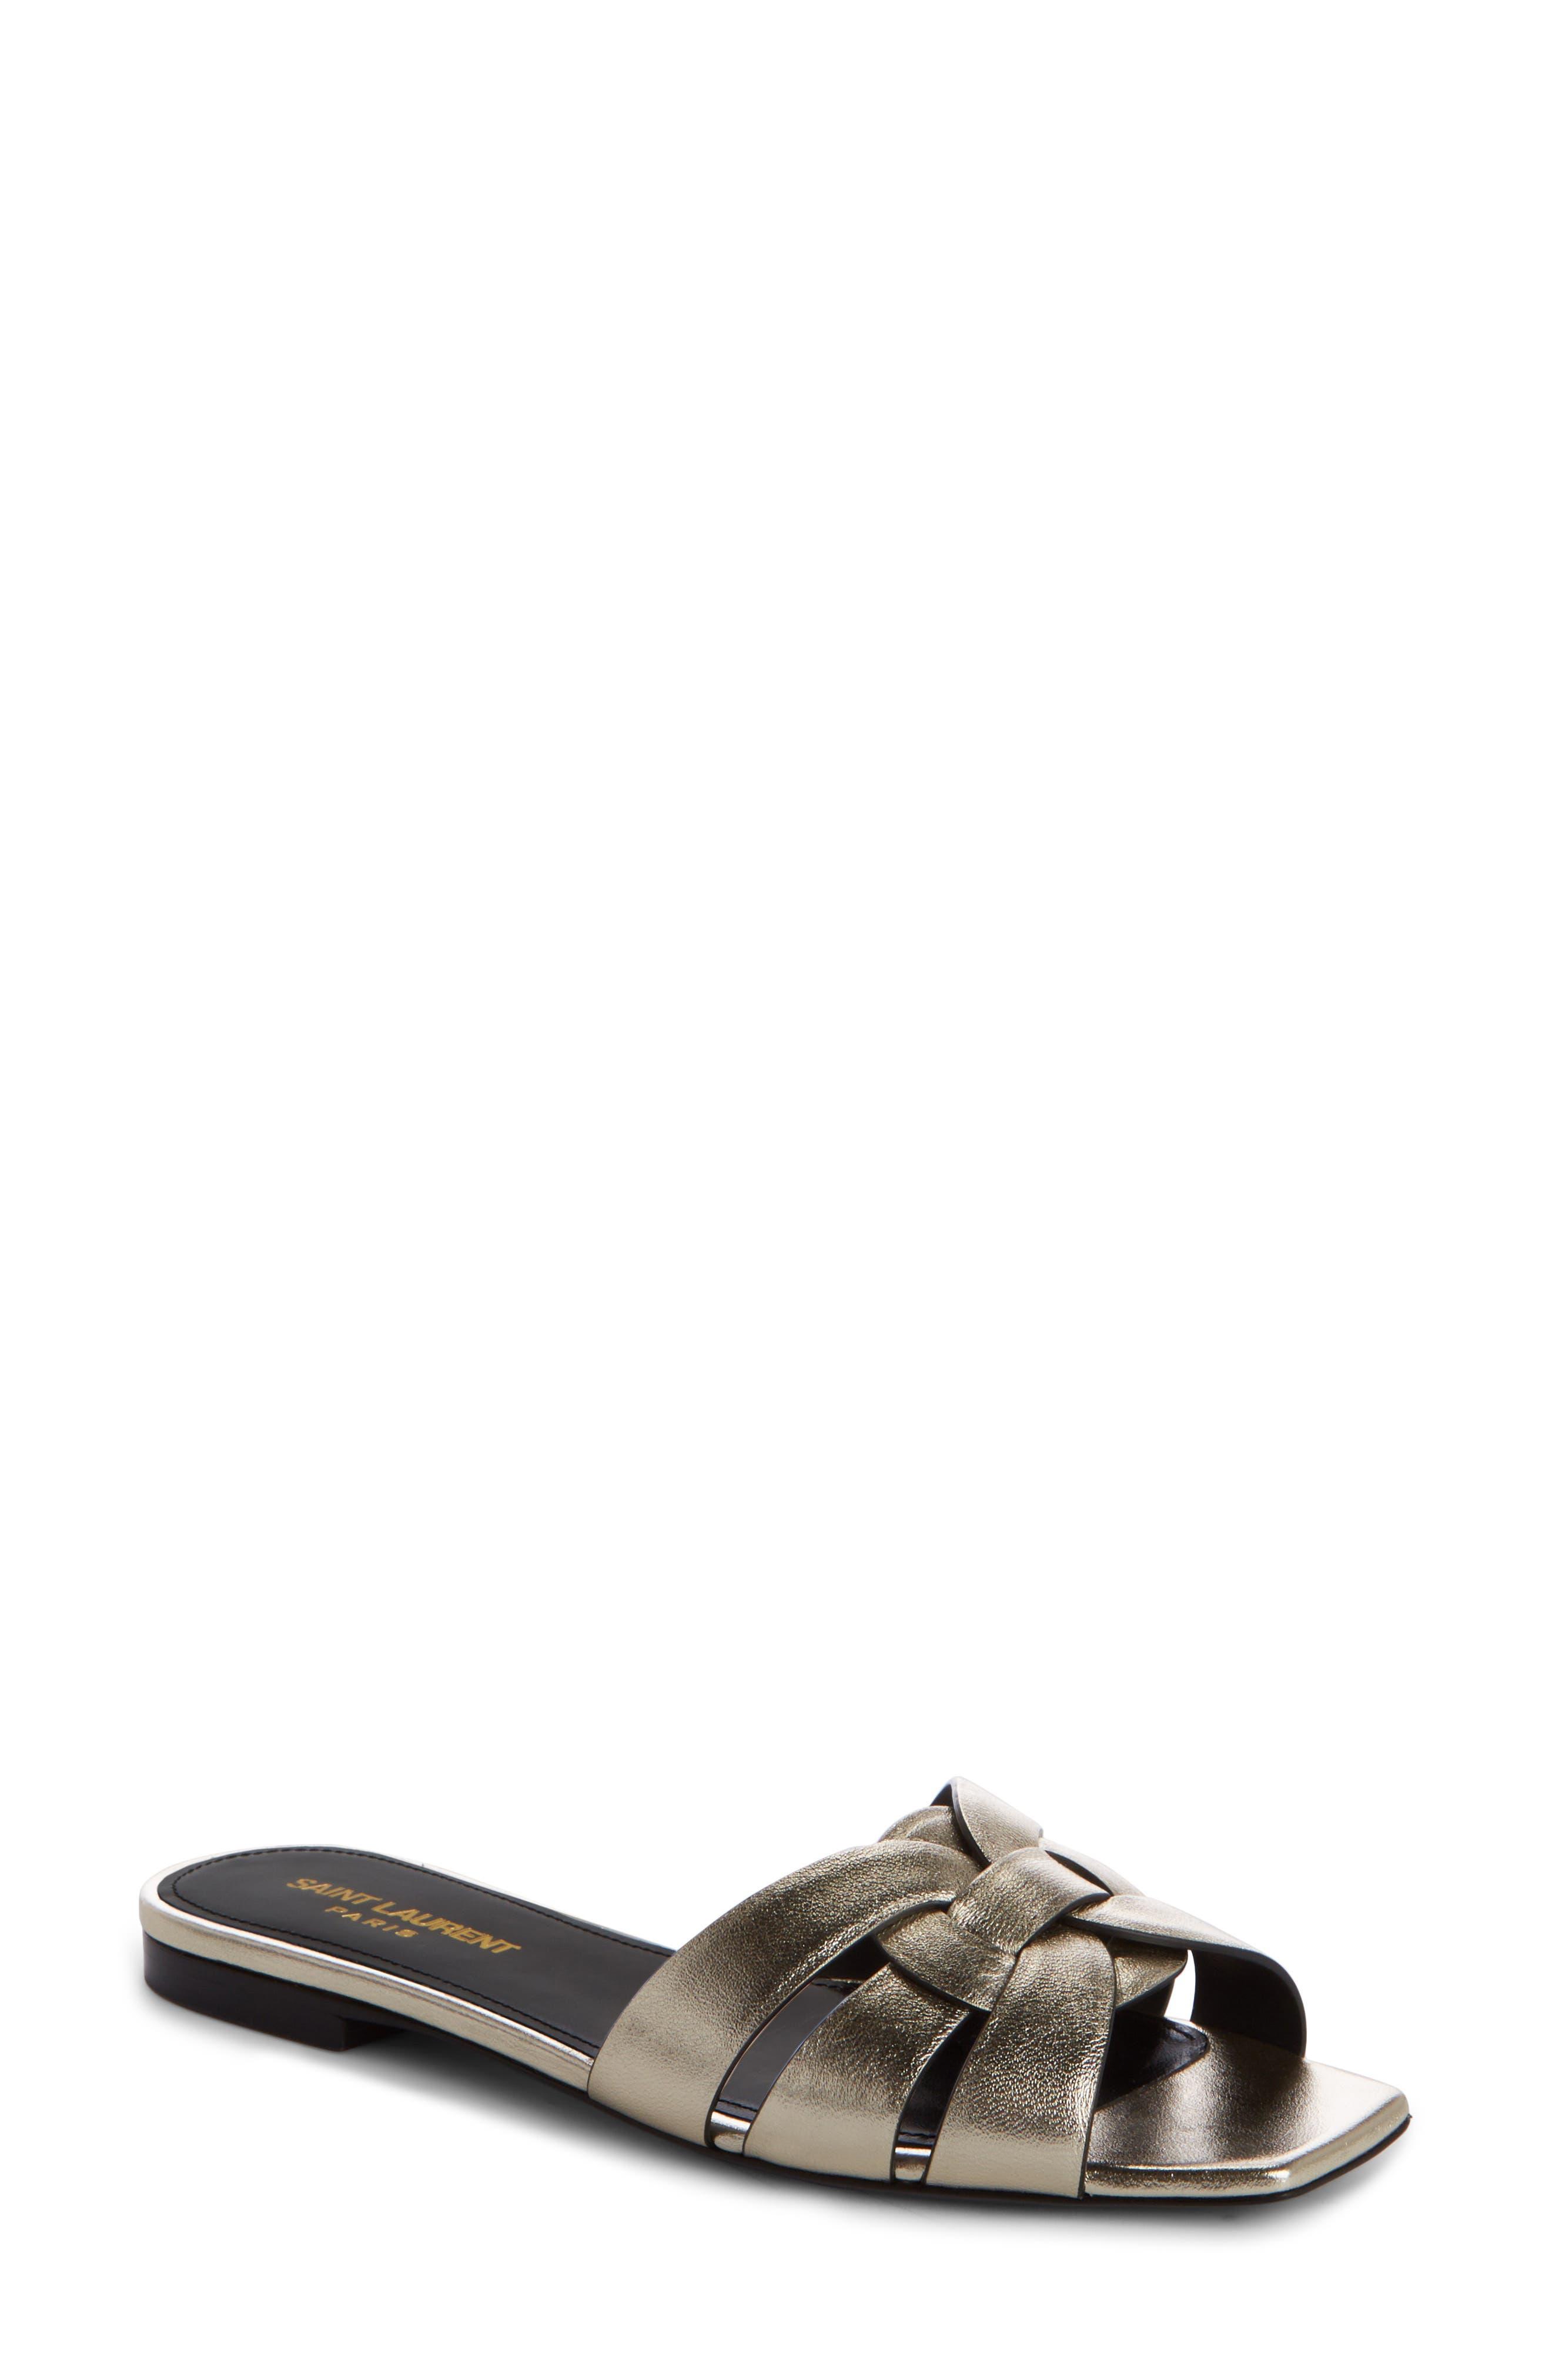 Nu Pieds Strappy Slide Sandal,                         Main,                         color, 7100 OR PALE